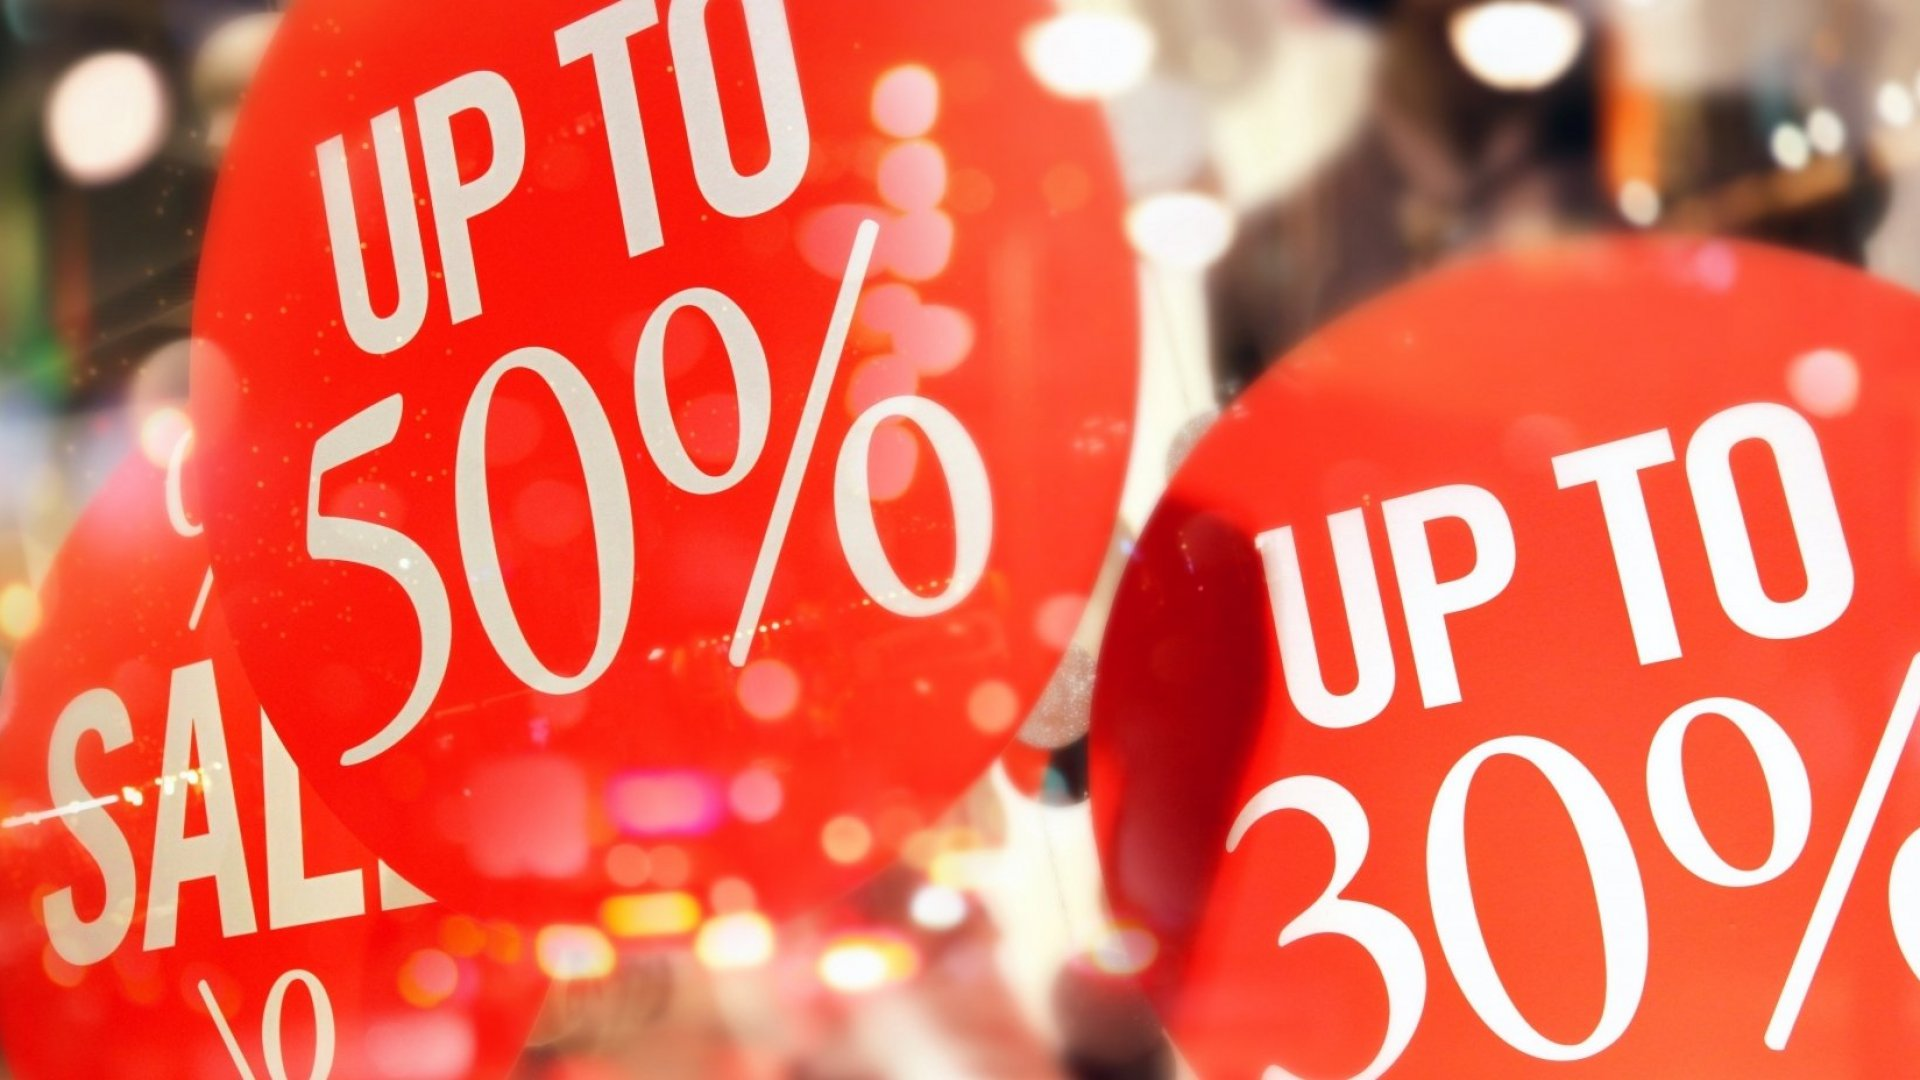 Discounts Make You Dumb: 3 Ways to Raise Your Money IQ When Shopping